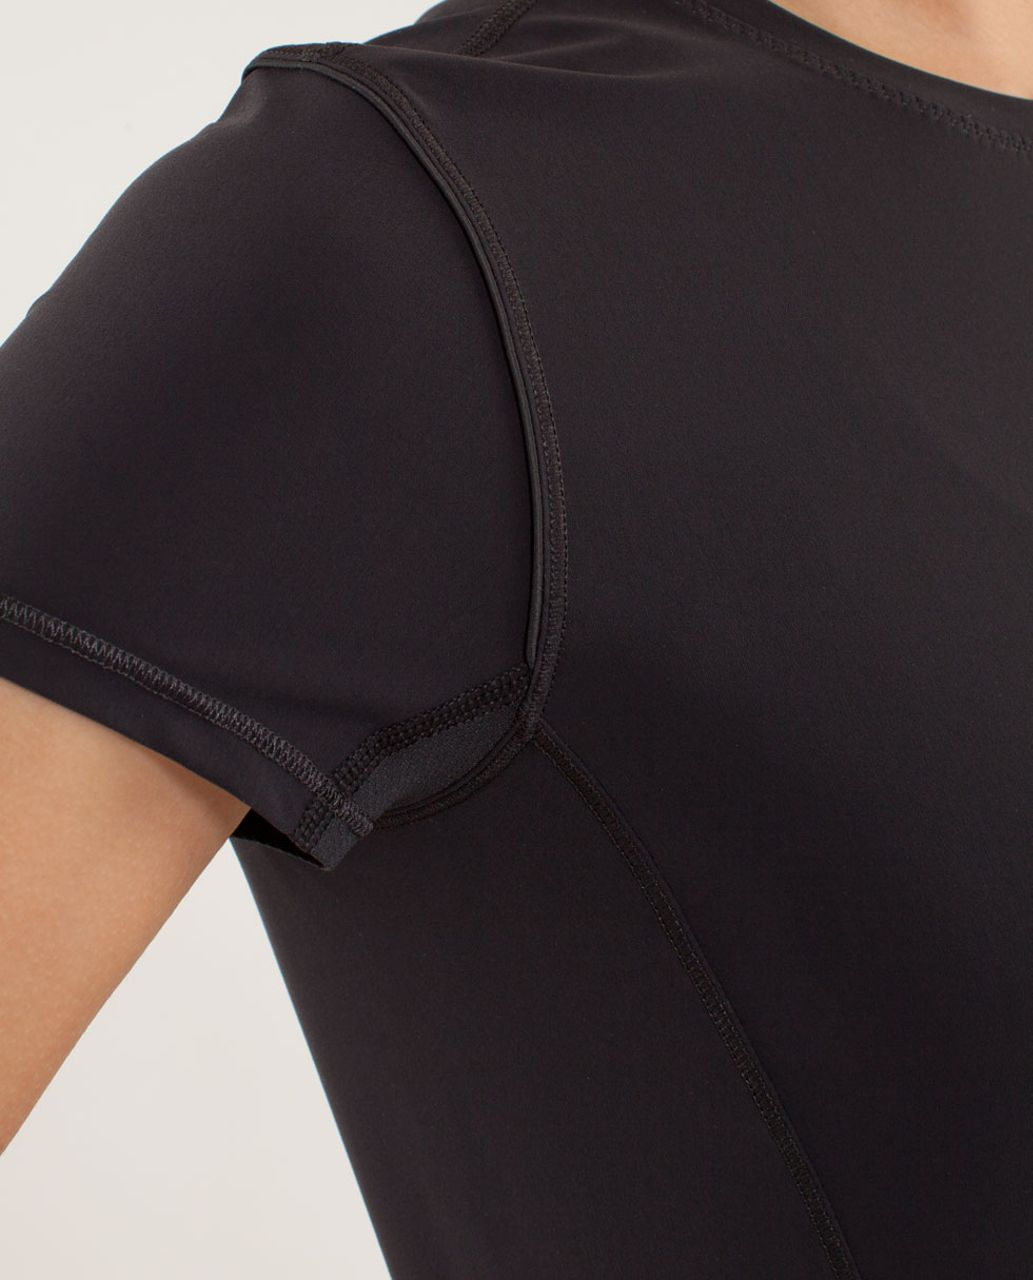 Lululemon Runbeam Short Sleeve (First Release) - Black